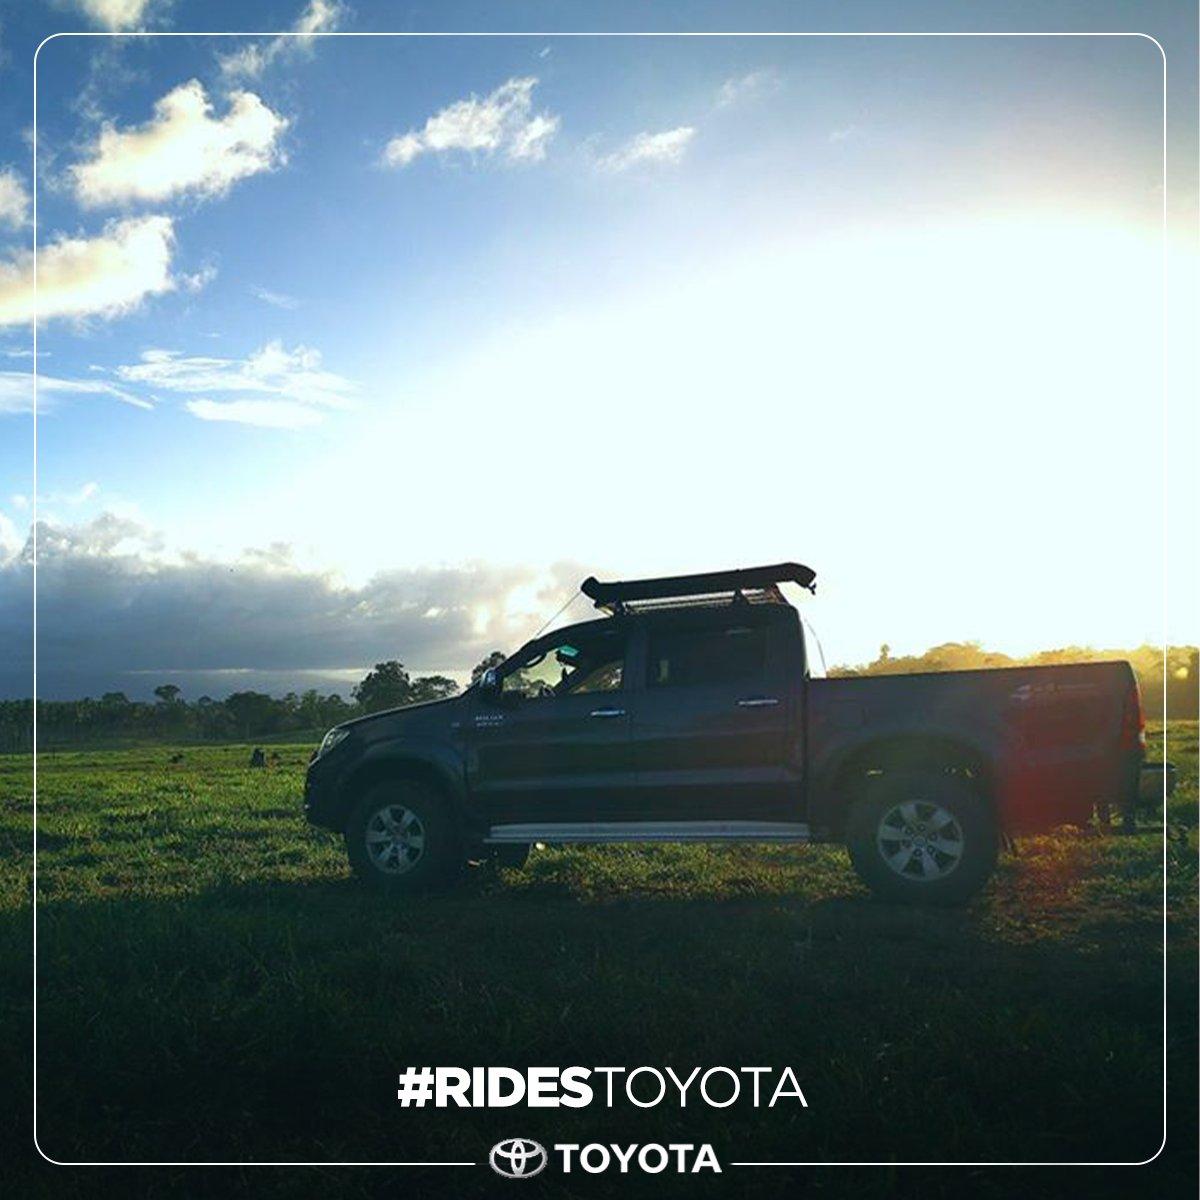 Todos tenemos nuestros lugares favoritos para irnos de ride.  📸 Maikol Méndez Rodríguez  #toyota #hilux #ridestoyota https://t.co/PFWdGnh8Wp